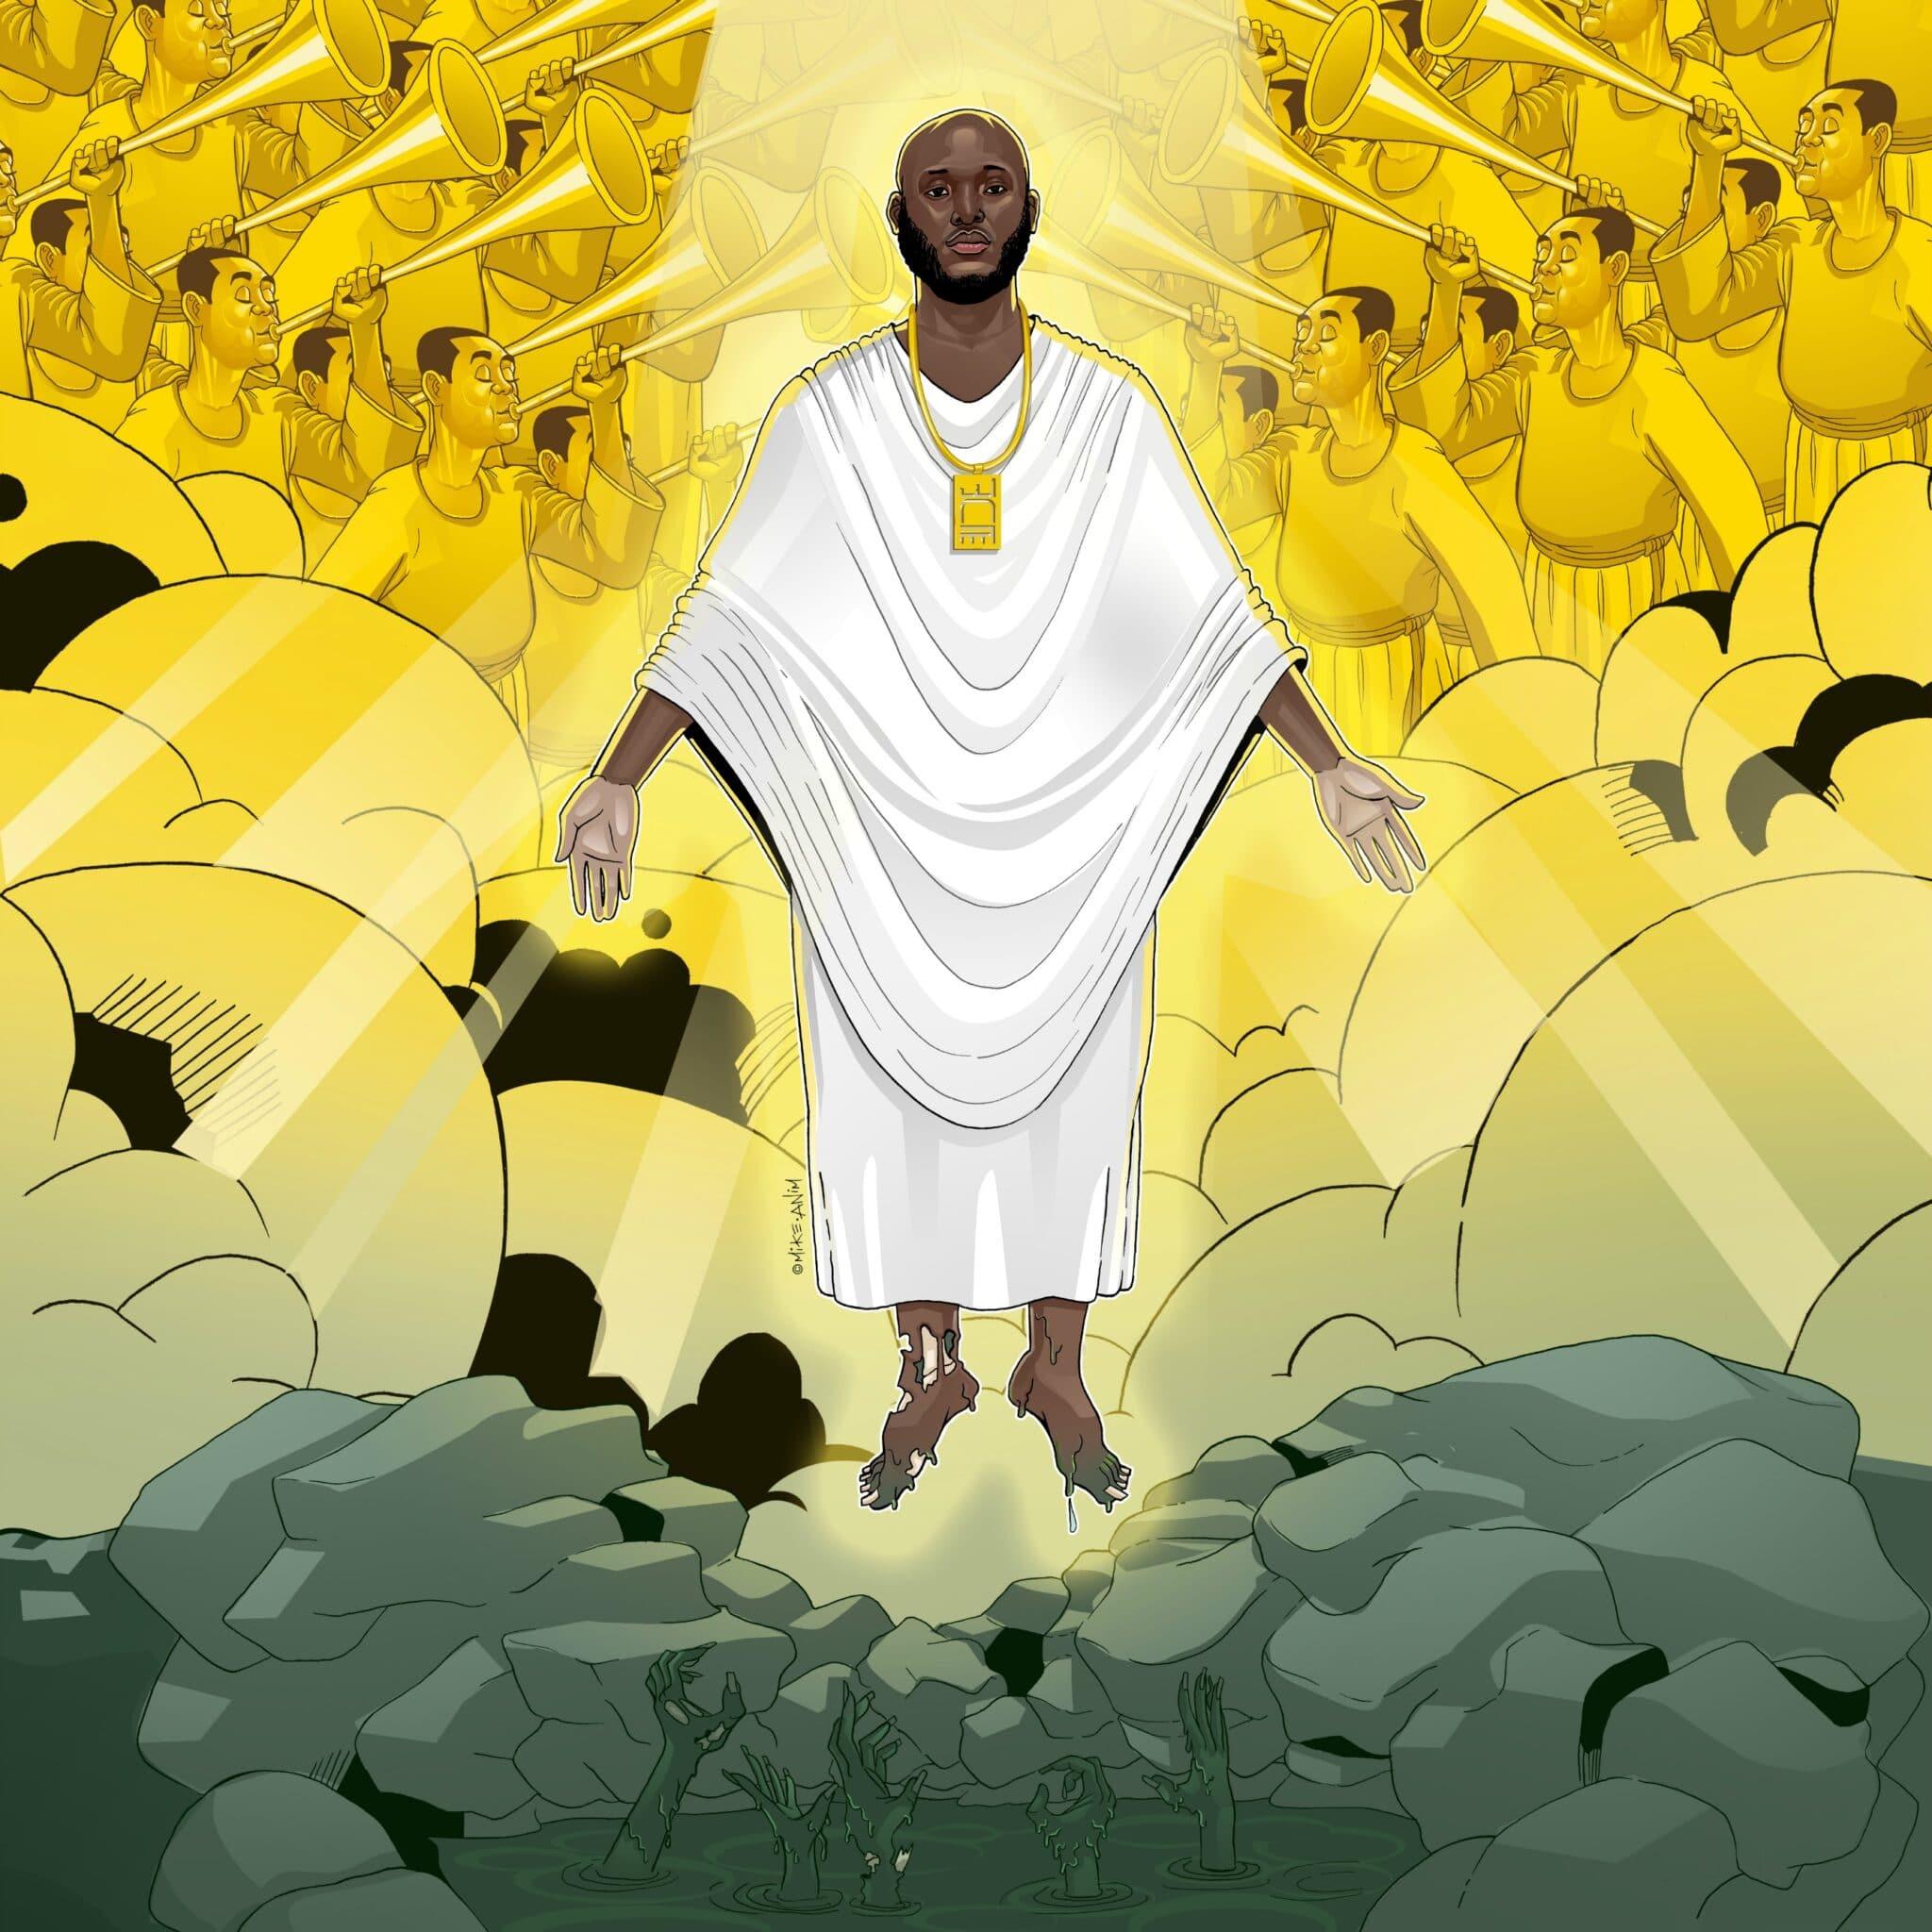 Ntelabi Unveils Artwork For Upcoming Single 'Glory'